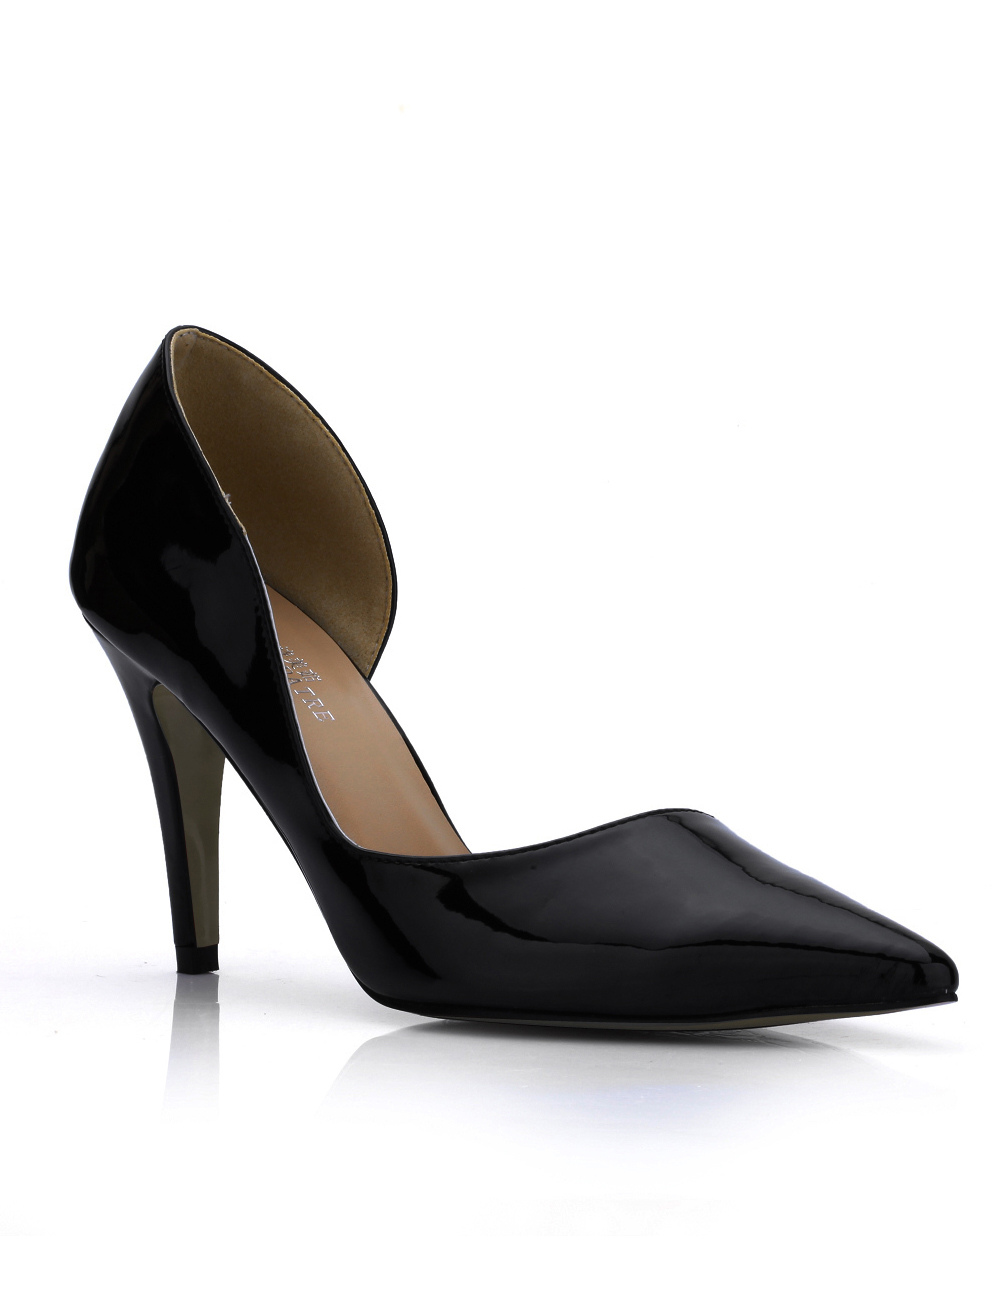 Vintage Black Patent Leather Pointed Toe Women's Dress Pumps thumbnail